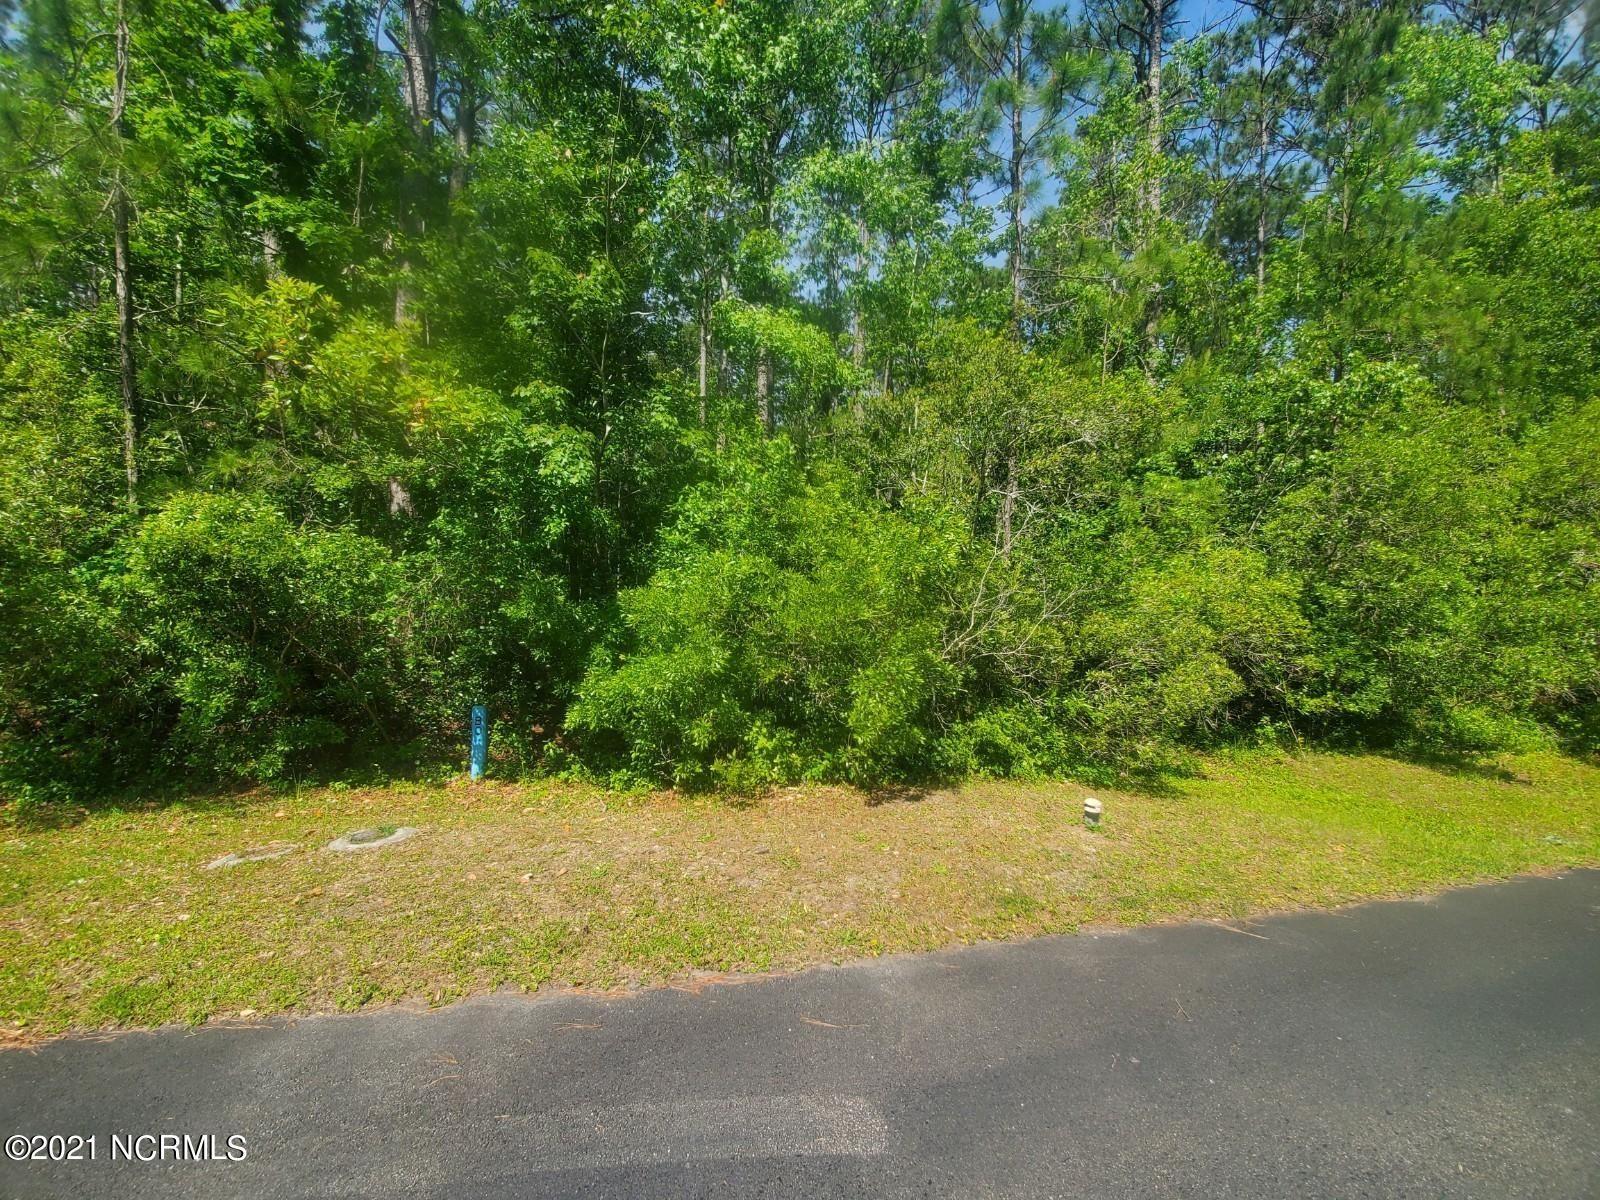 Photo of 0 Patton Lane, Hampstead, NC 28443 (MLS # 100272025)